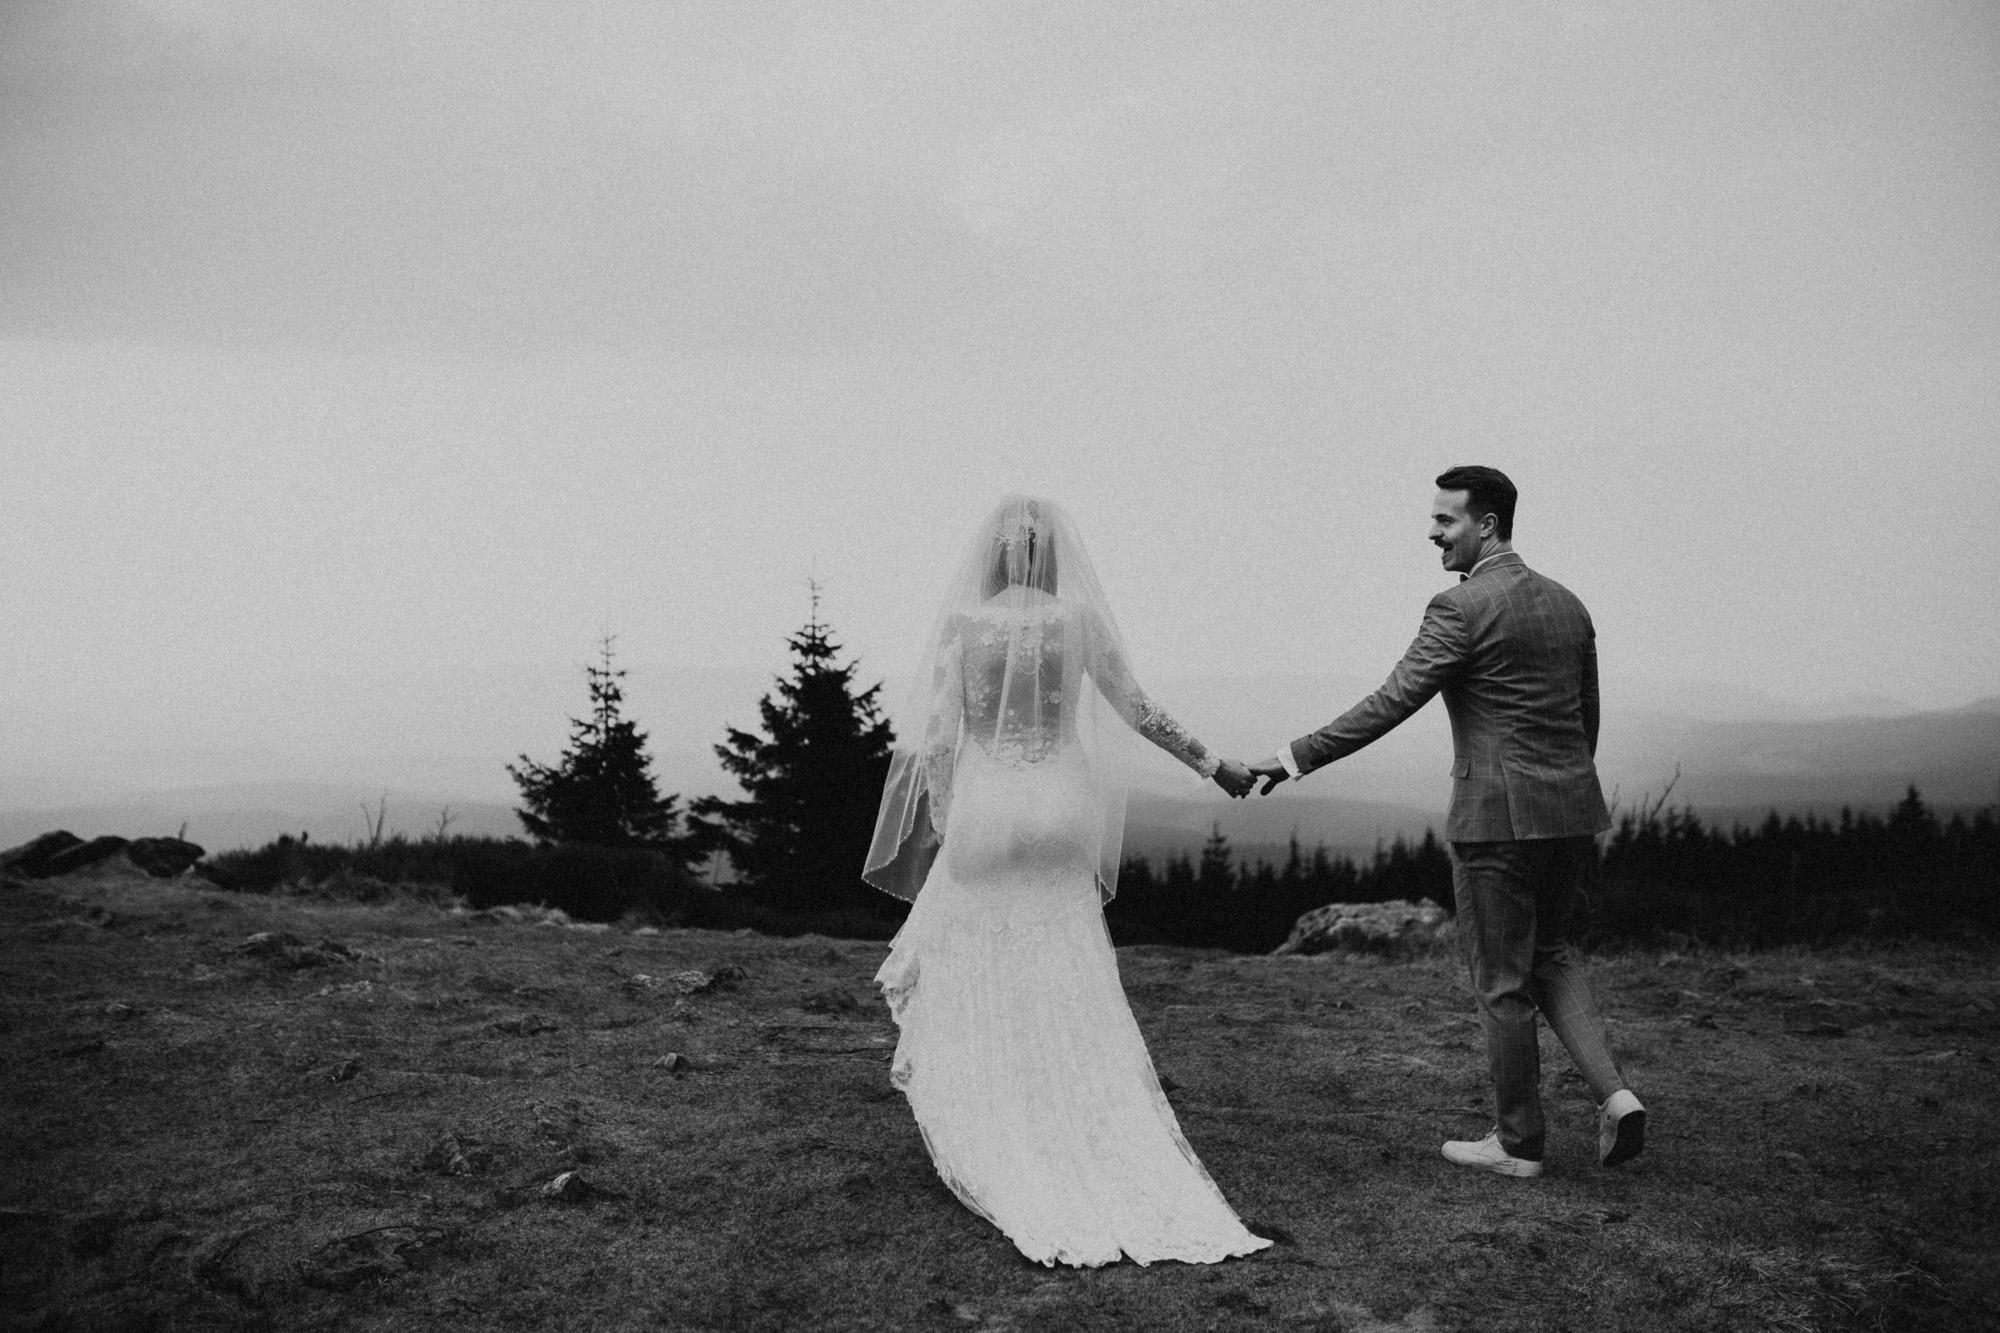 DanielaMarquardtPhotography_Hochzeitsfotograf_Düsseldorf_Köln_Mallorca_Bayern_Austria_Harz_LinaundMaik_Afterwedding-Shooting_Weddingphotographer_Ibiza_Tuskany_Italien_Toskana77